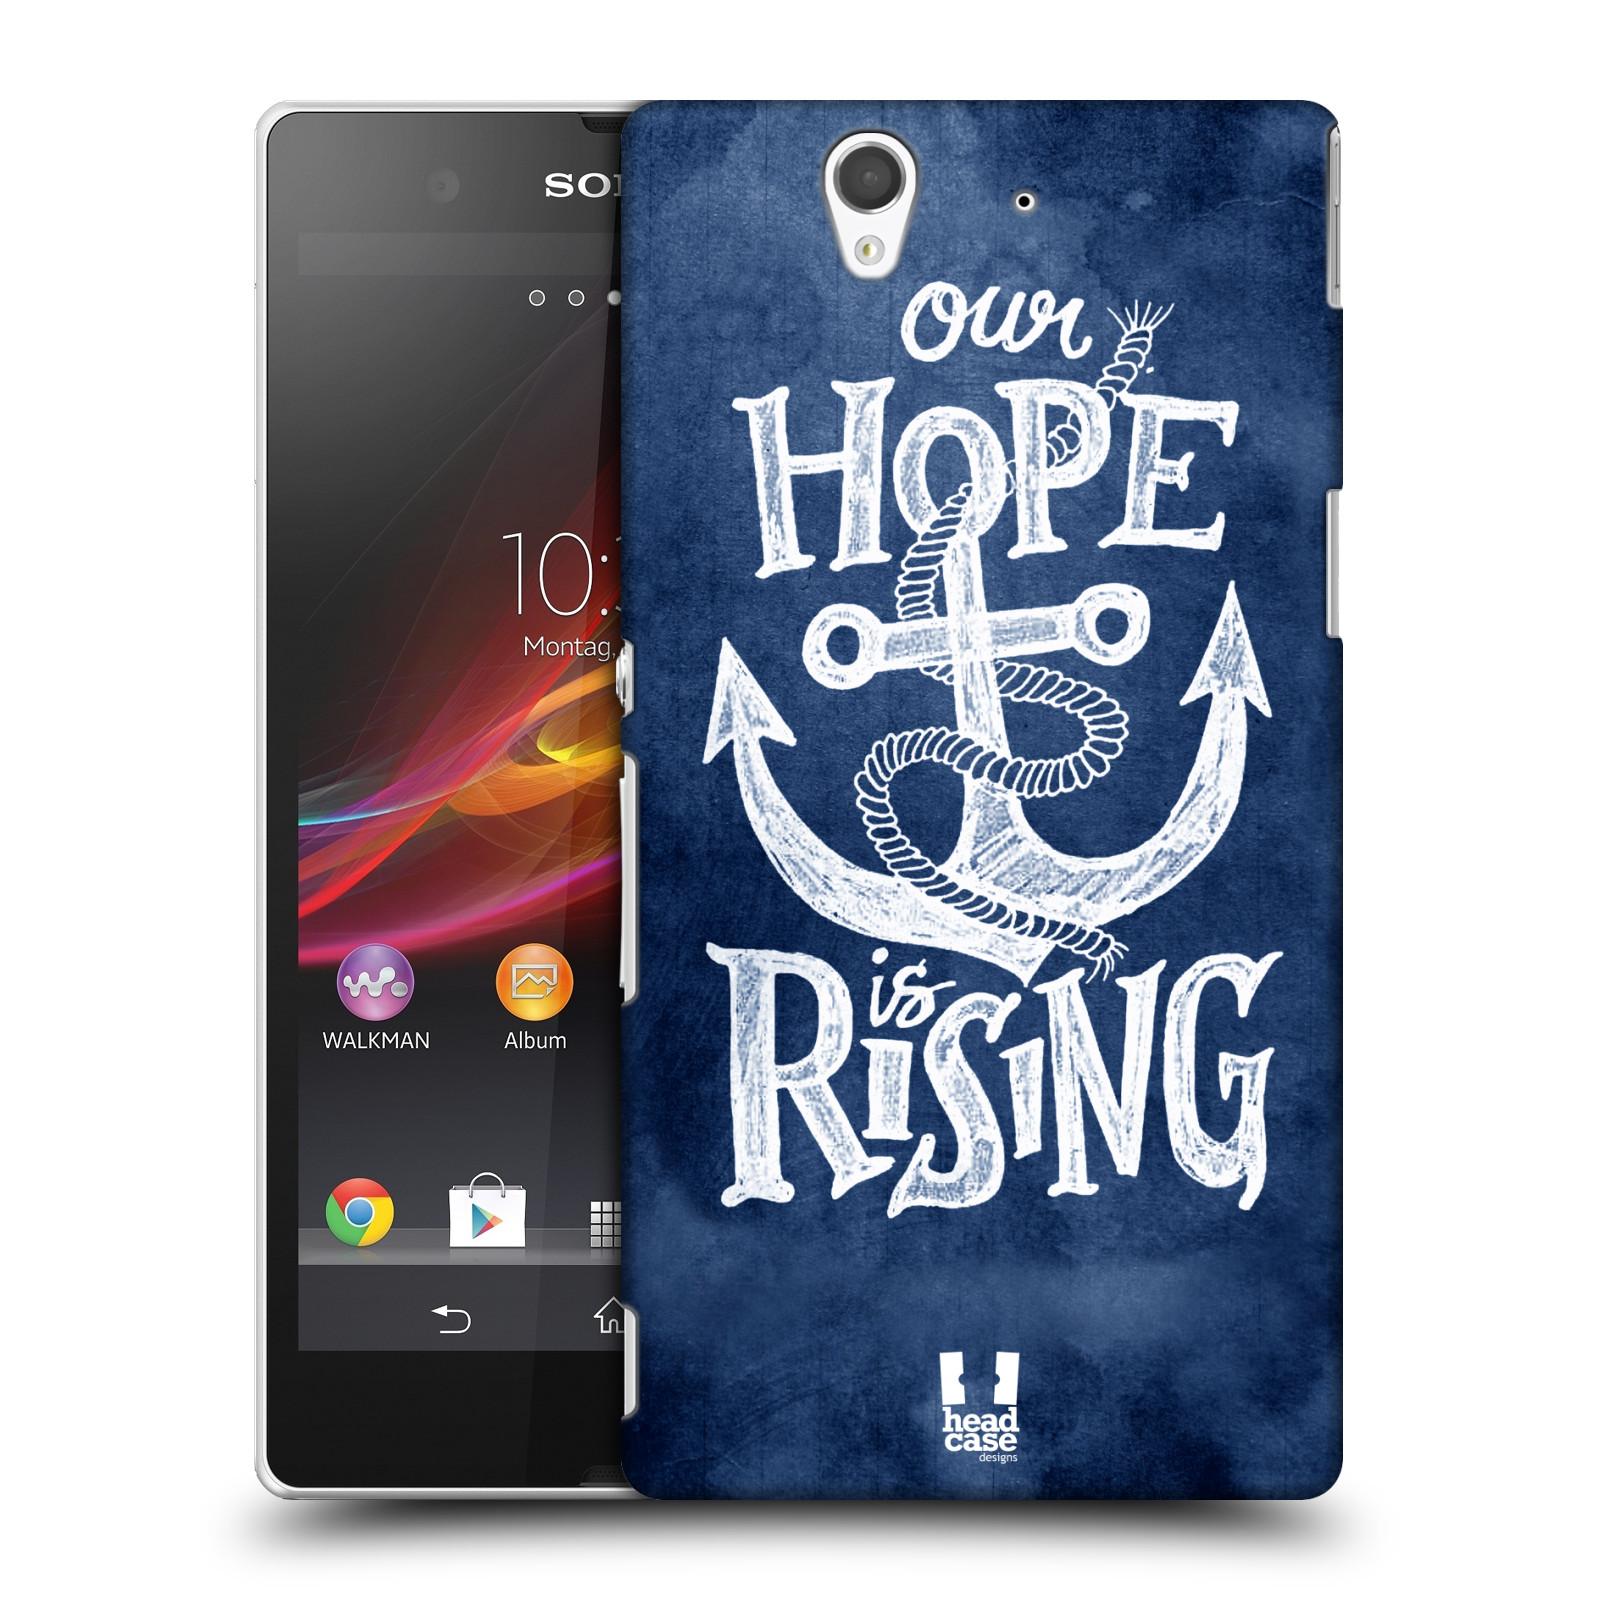 Plastové pouzdro na mobil Sony Xperia Z C6603 HEAD CASE KOTVA RISING